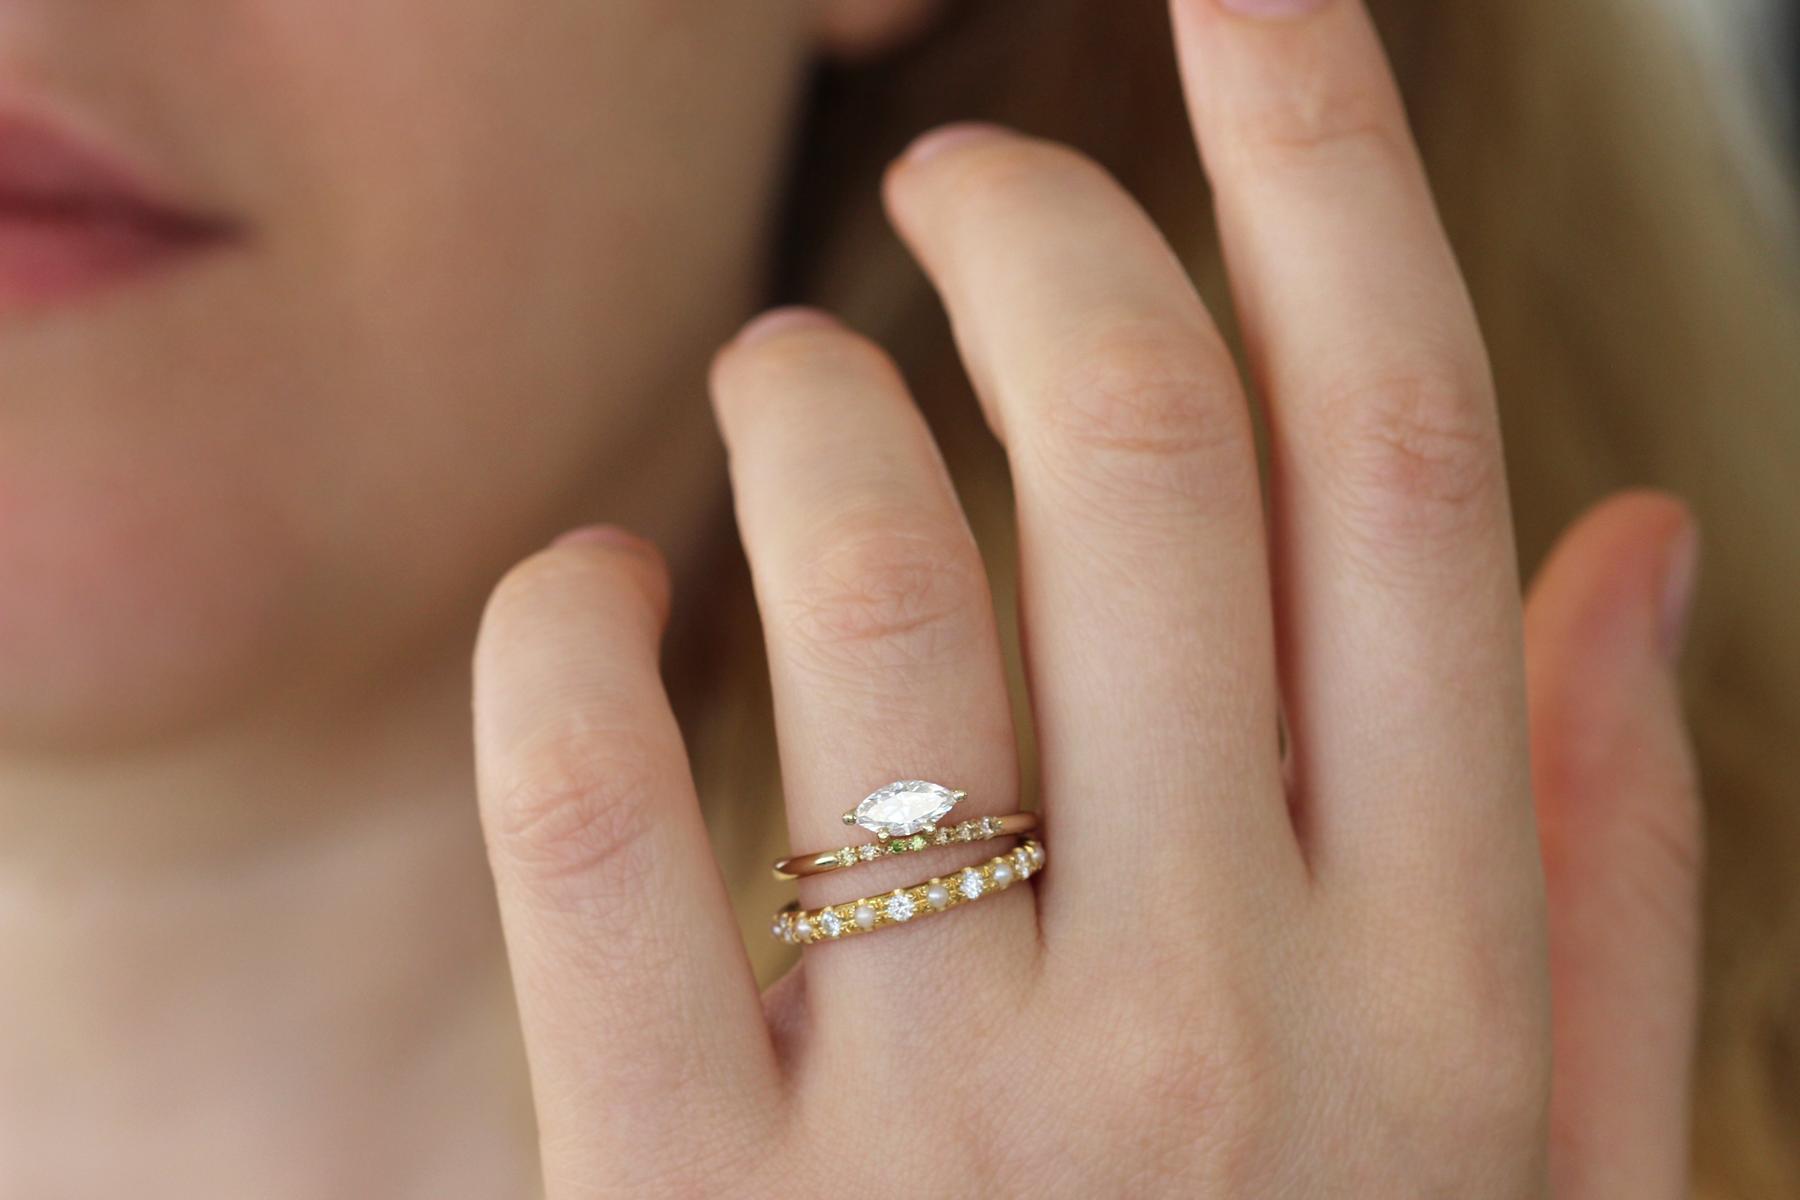 0.5 carat marquise diamond ring on finger Wedding ring